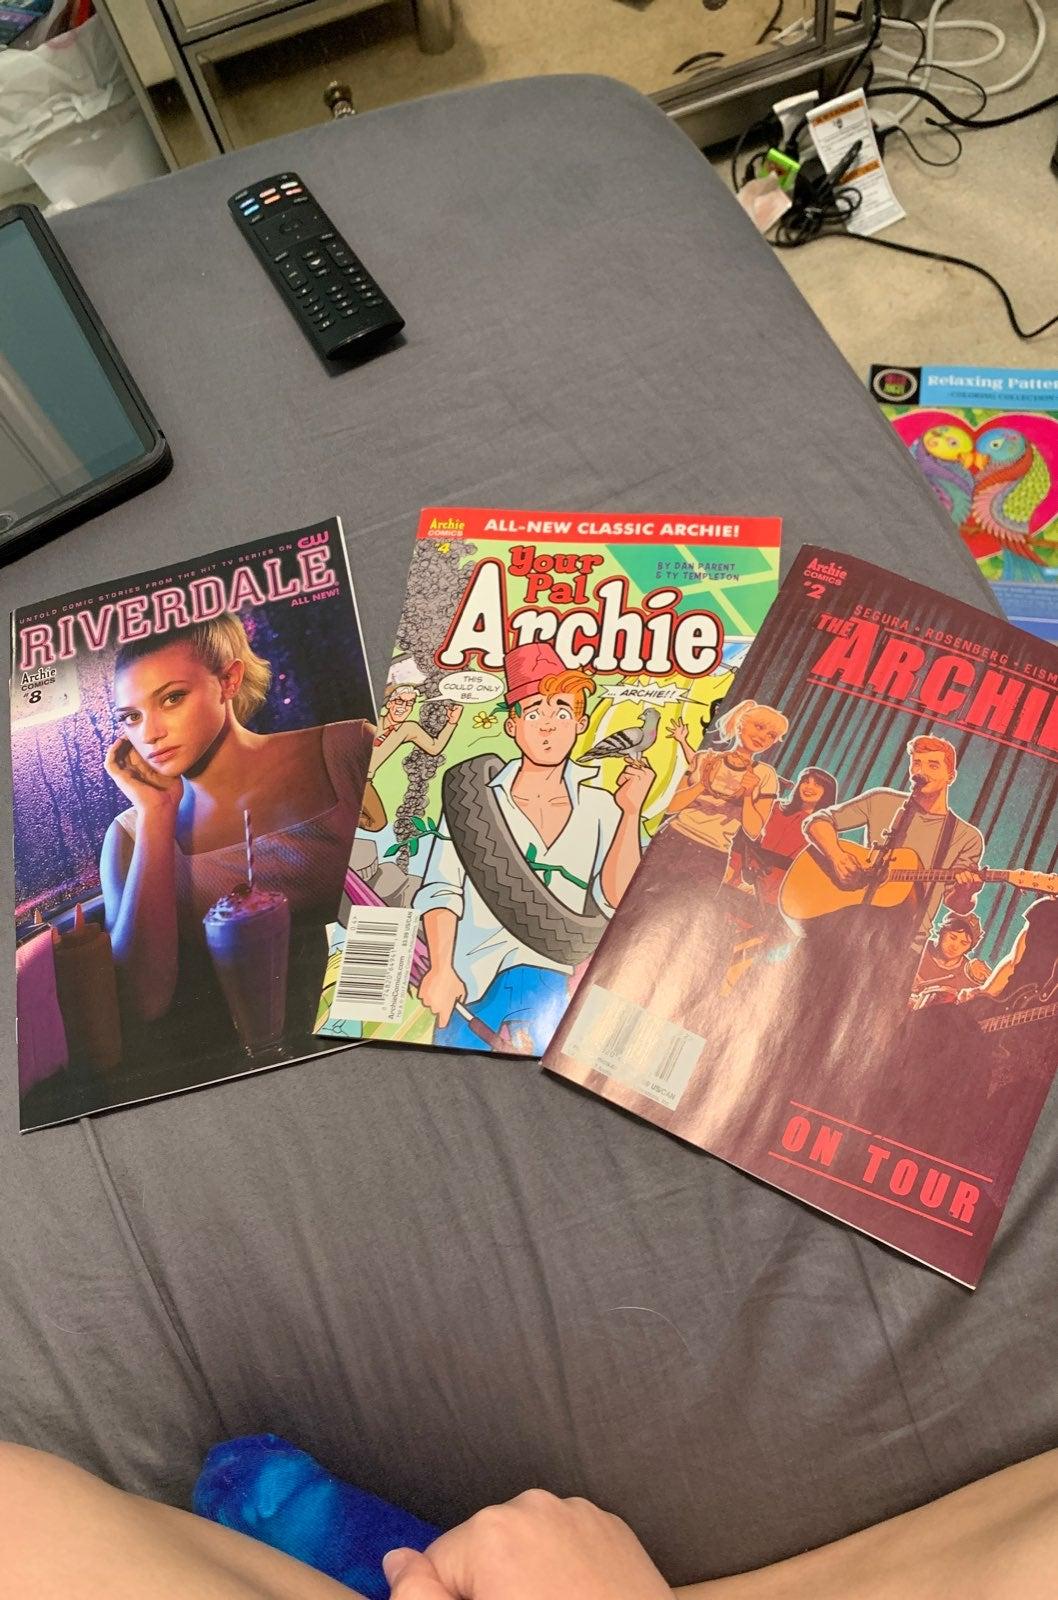 Vintage Archie Andrews comic books